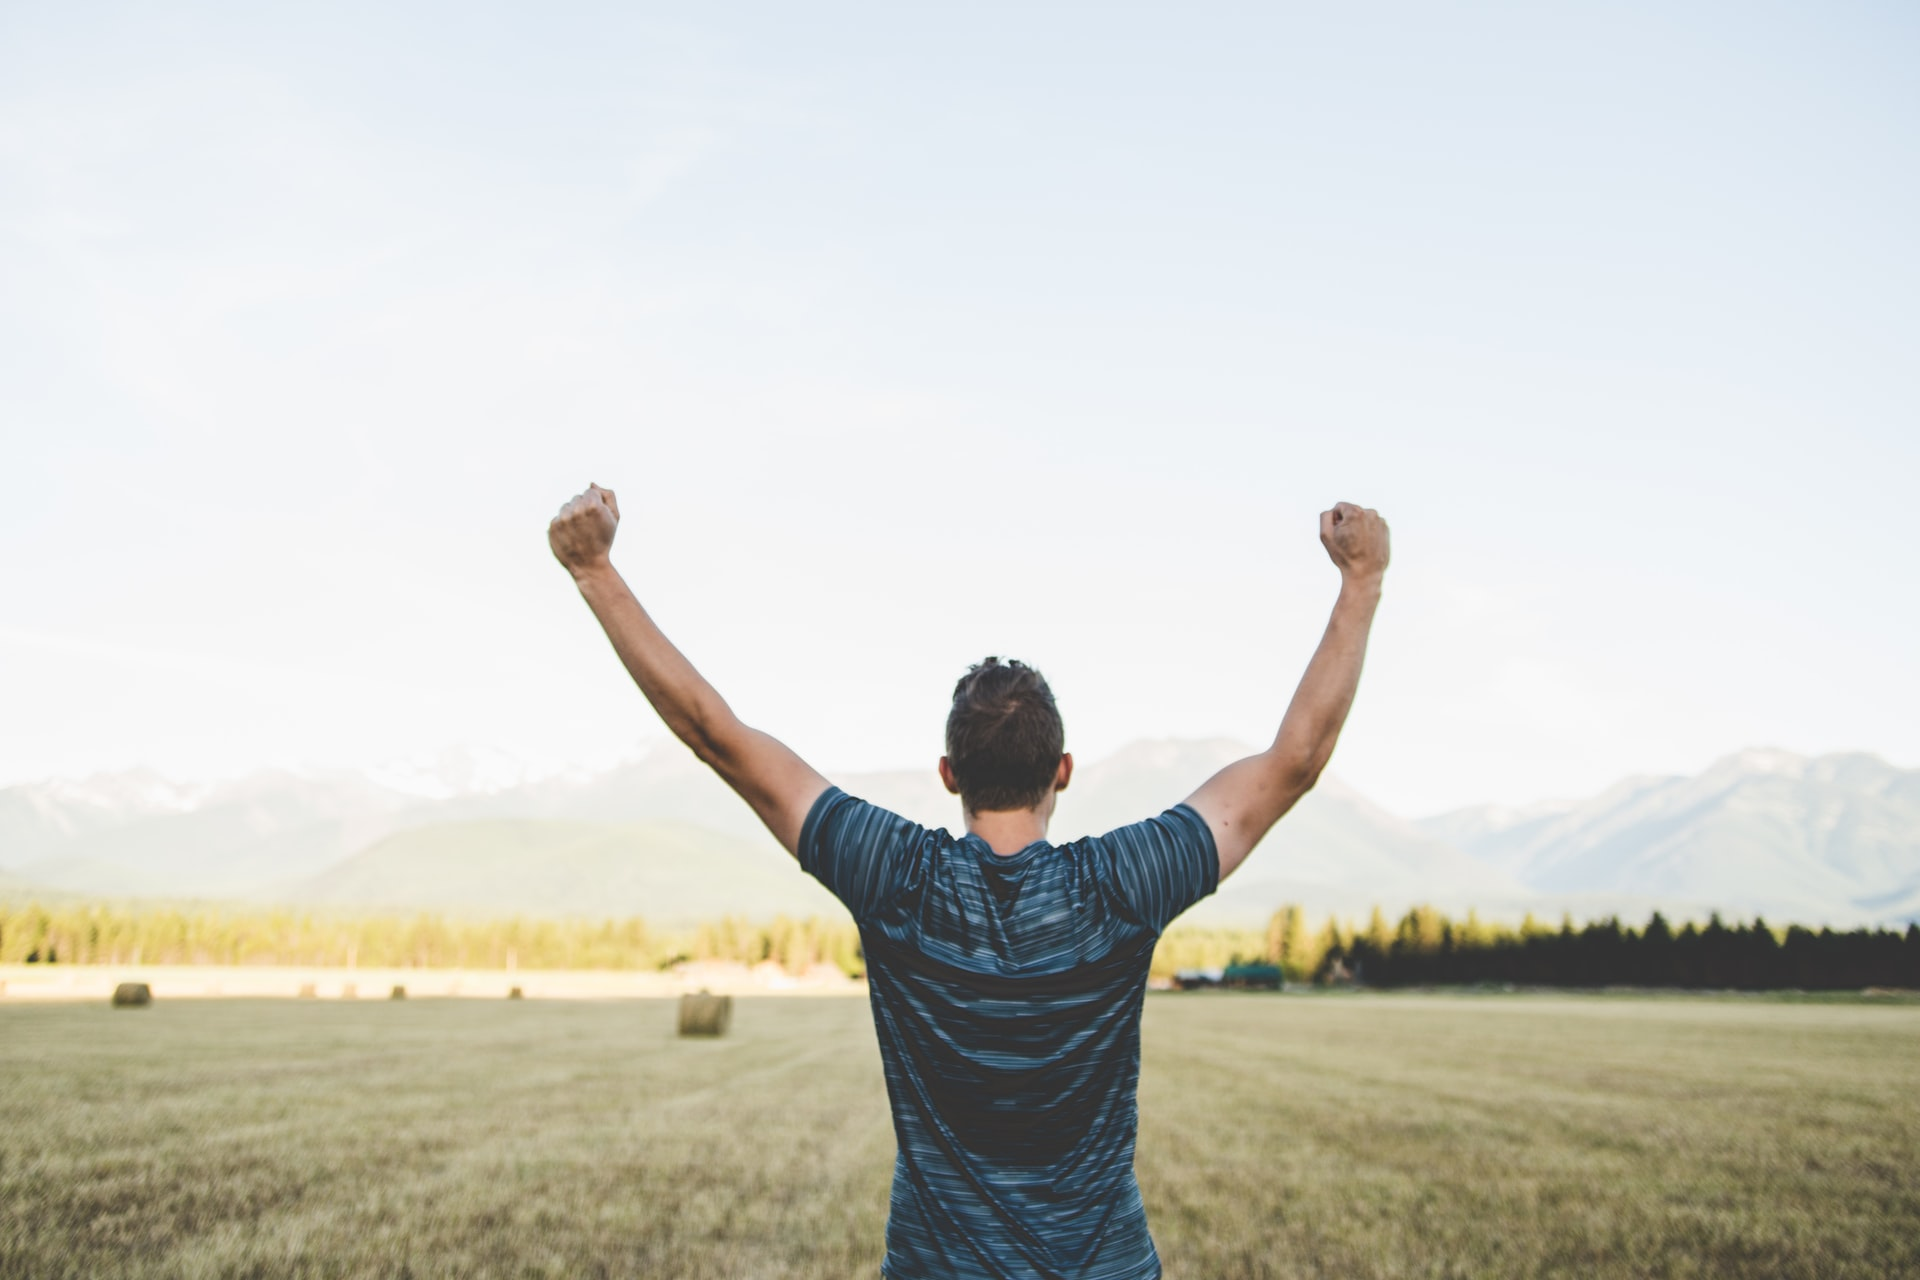 Joyful man with hands raised up